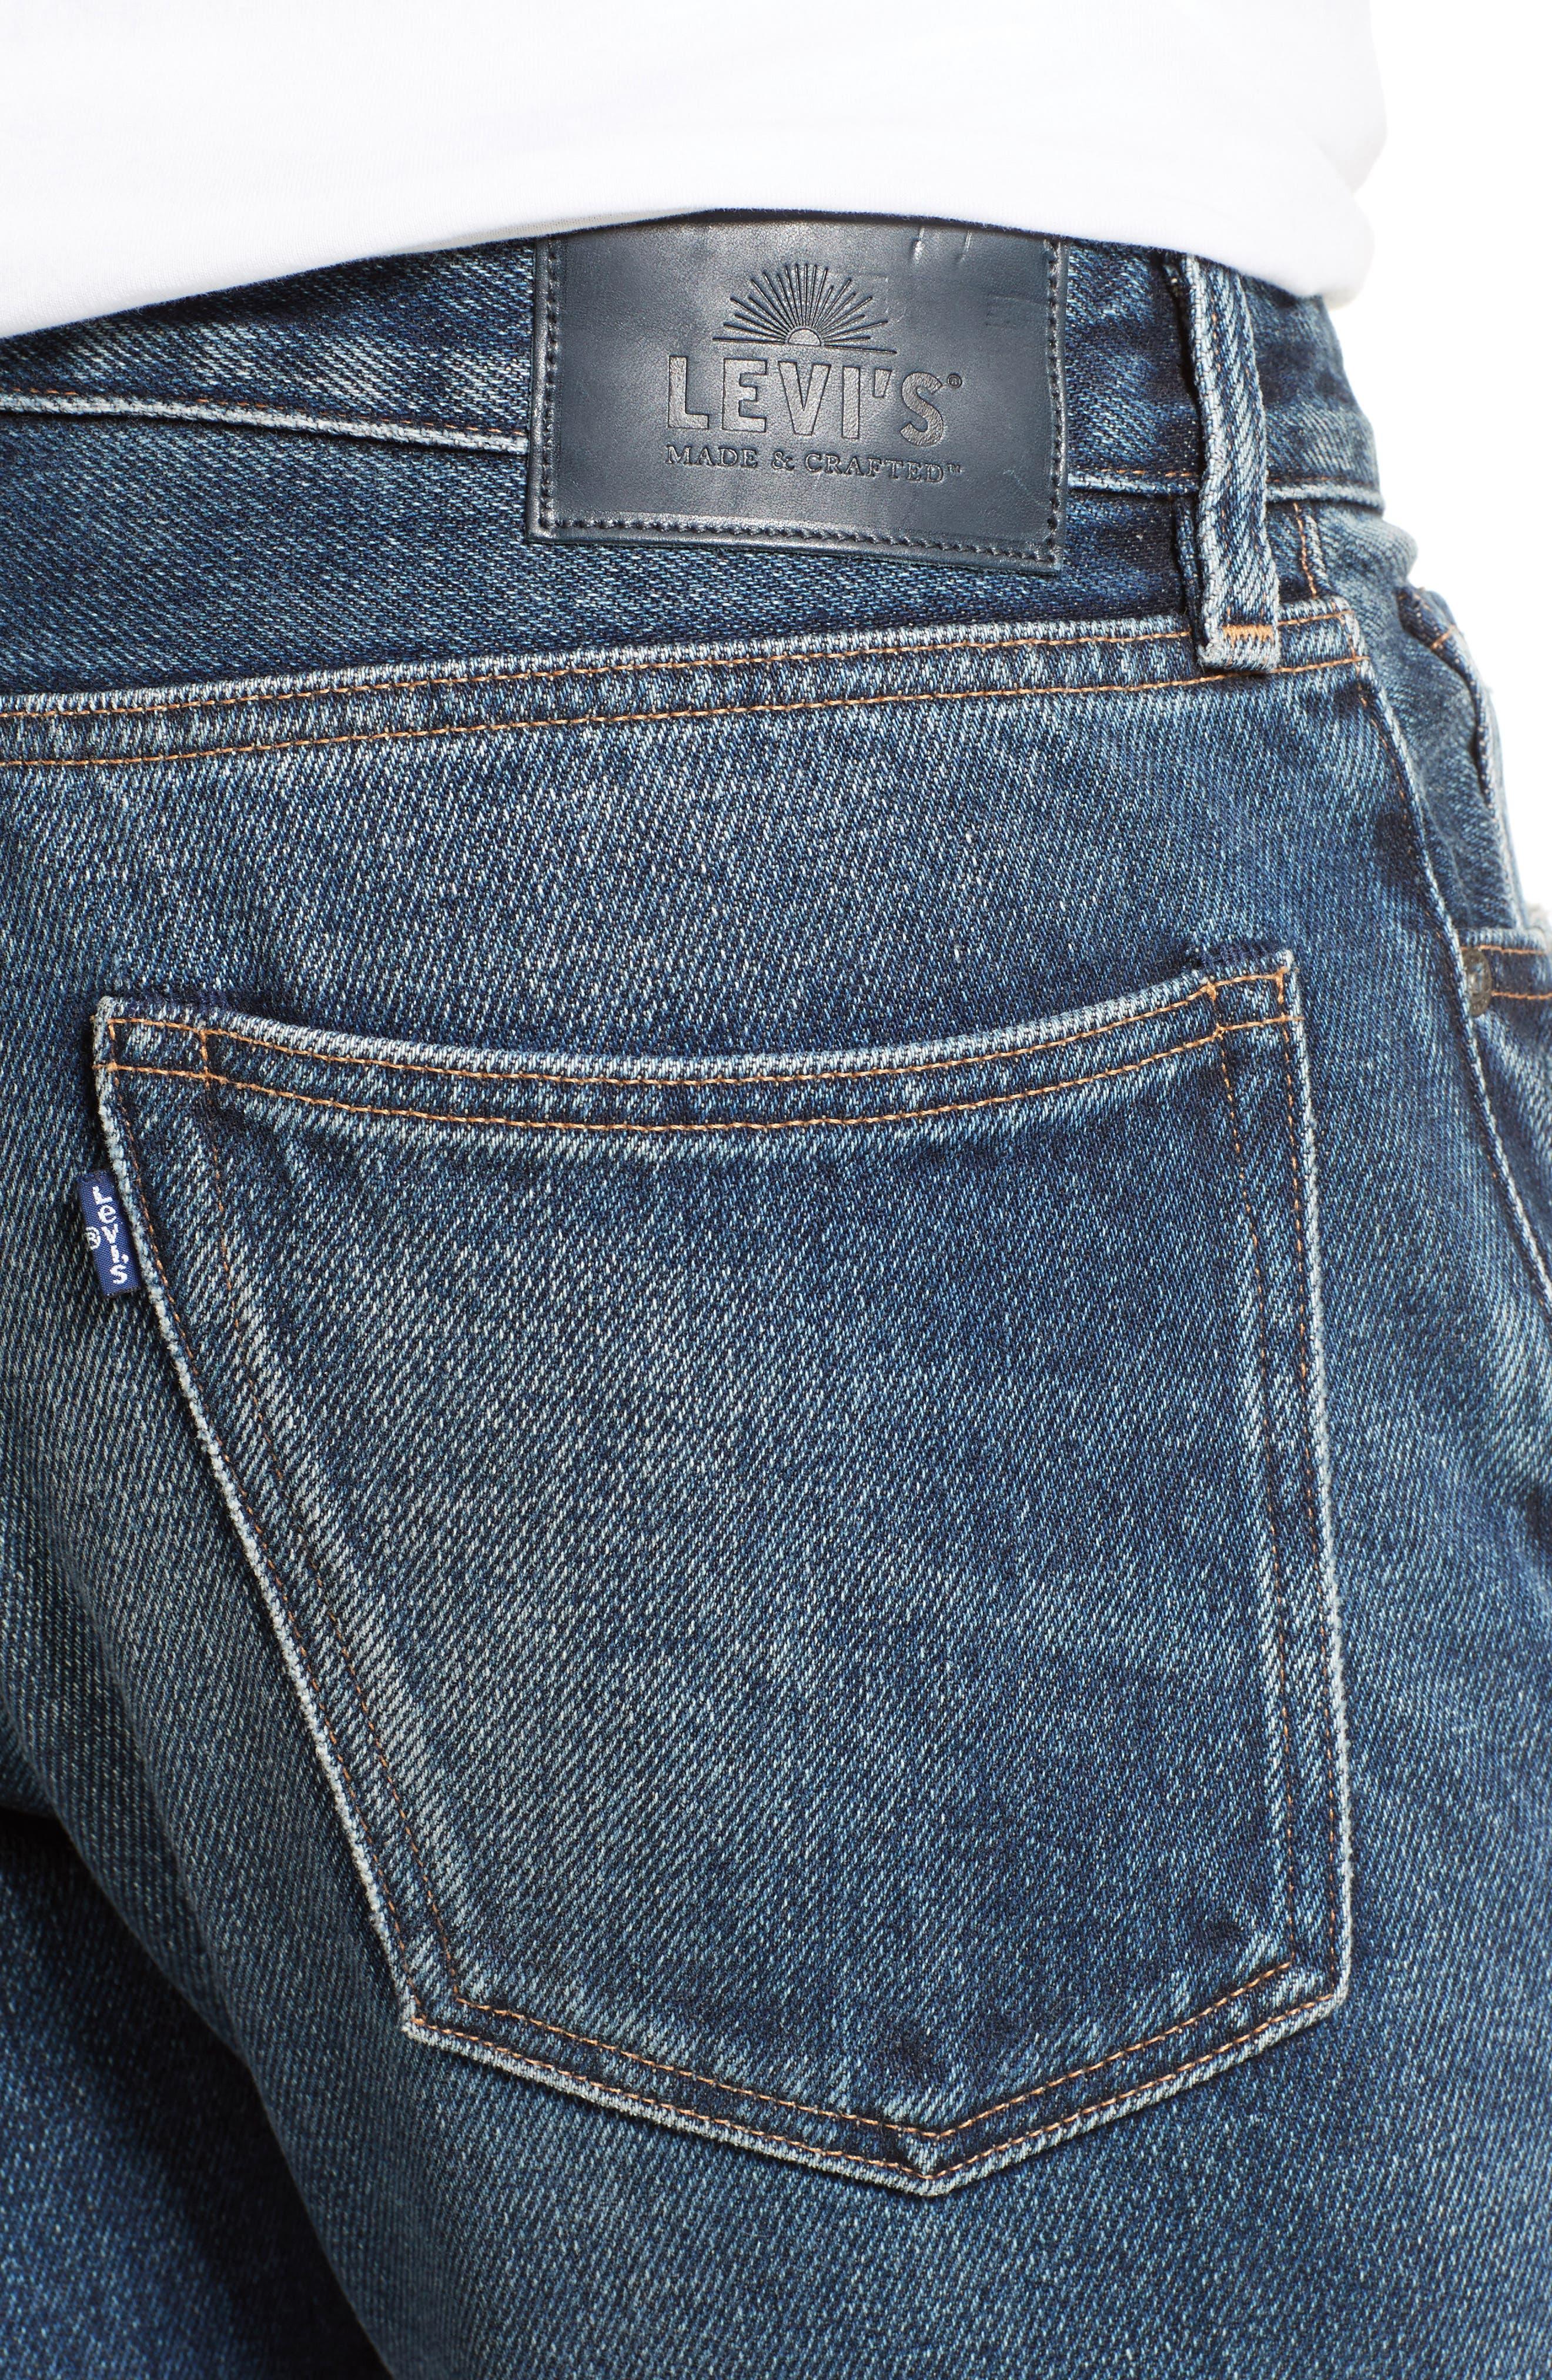 Tack Slim Fit Jeans,                             Alternate thumbnail 4, color,                             420